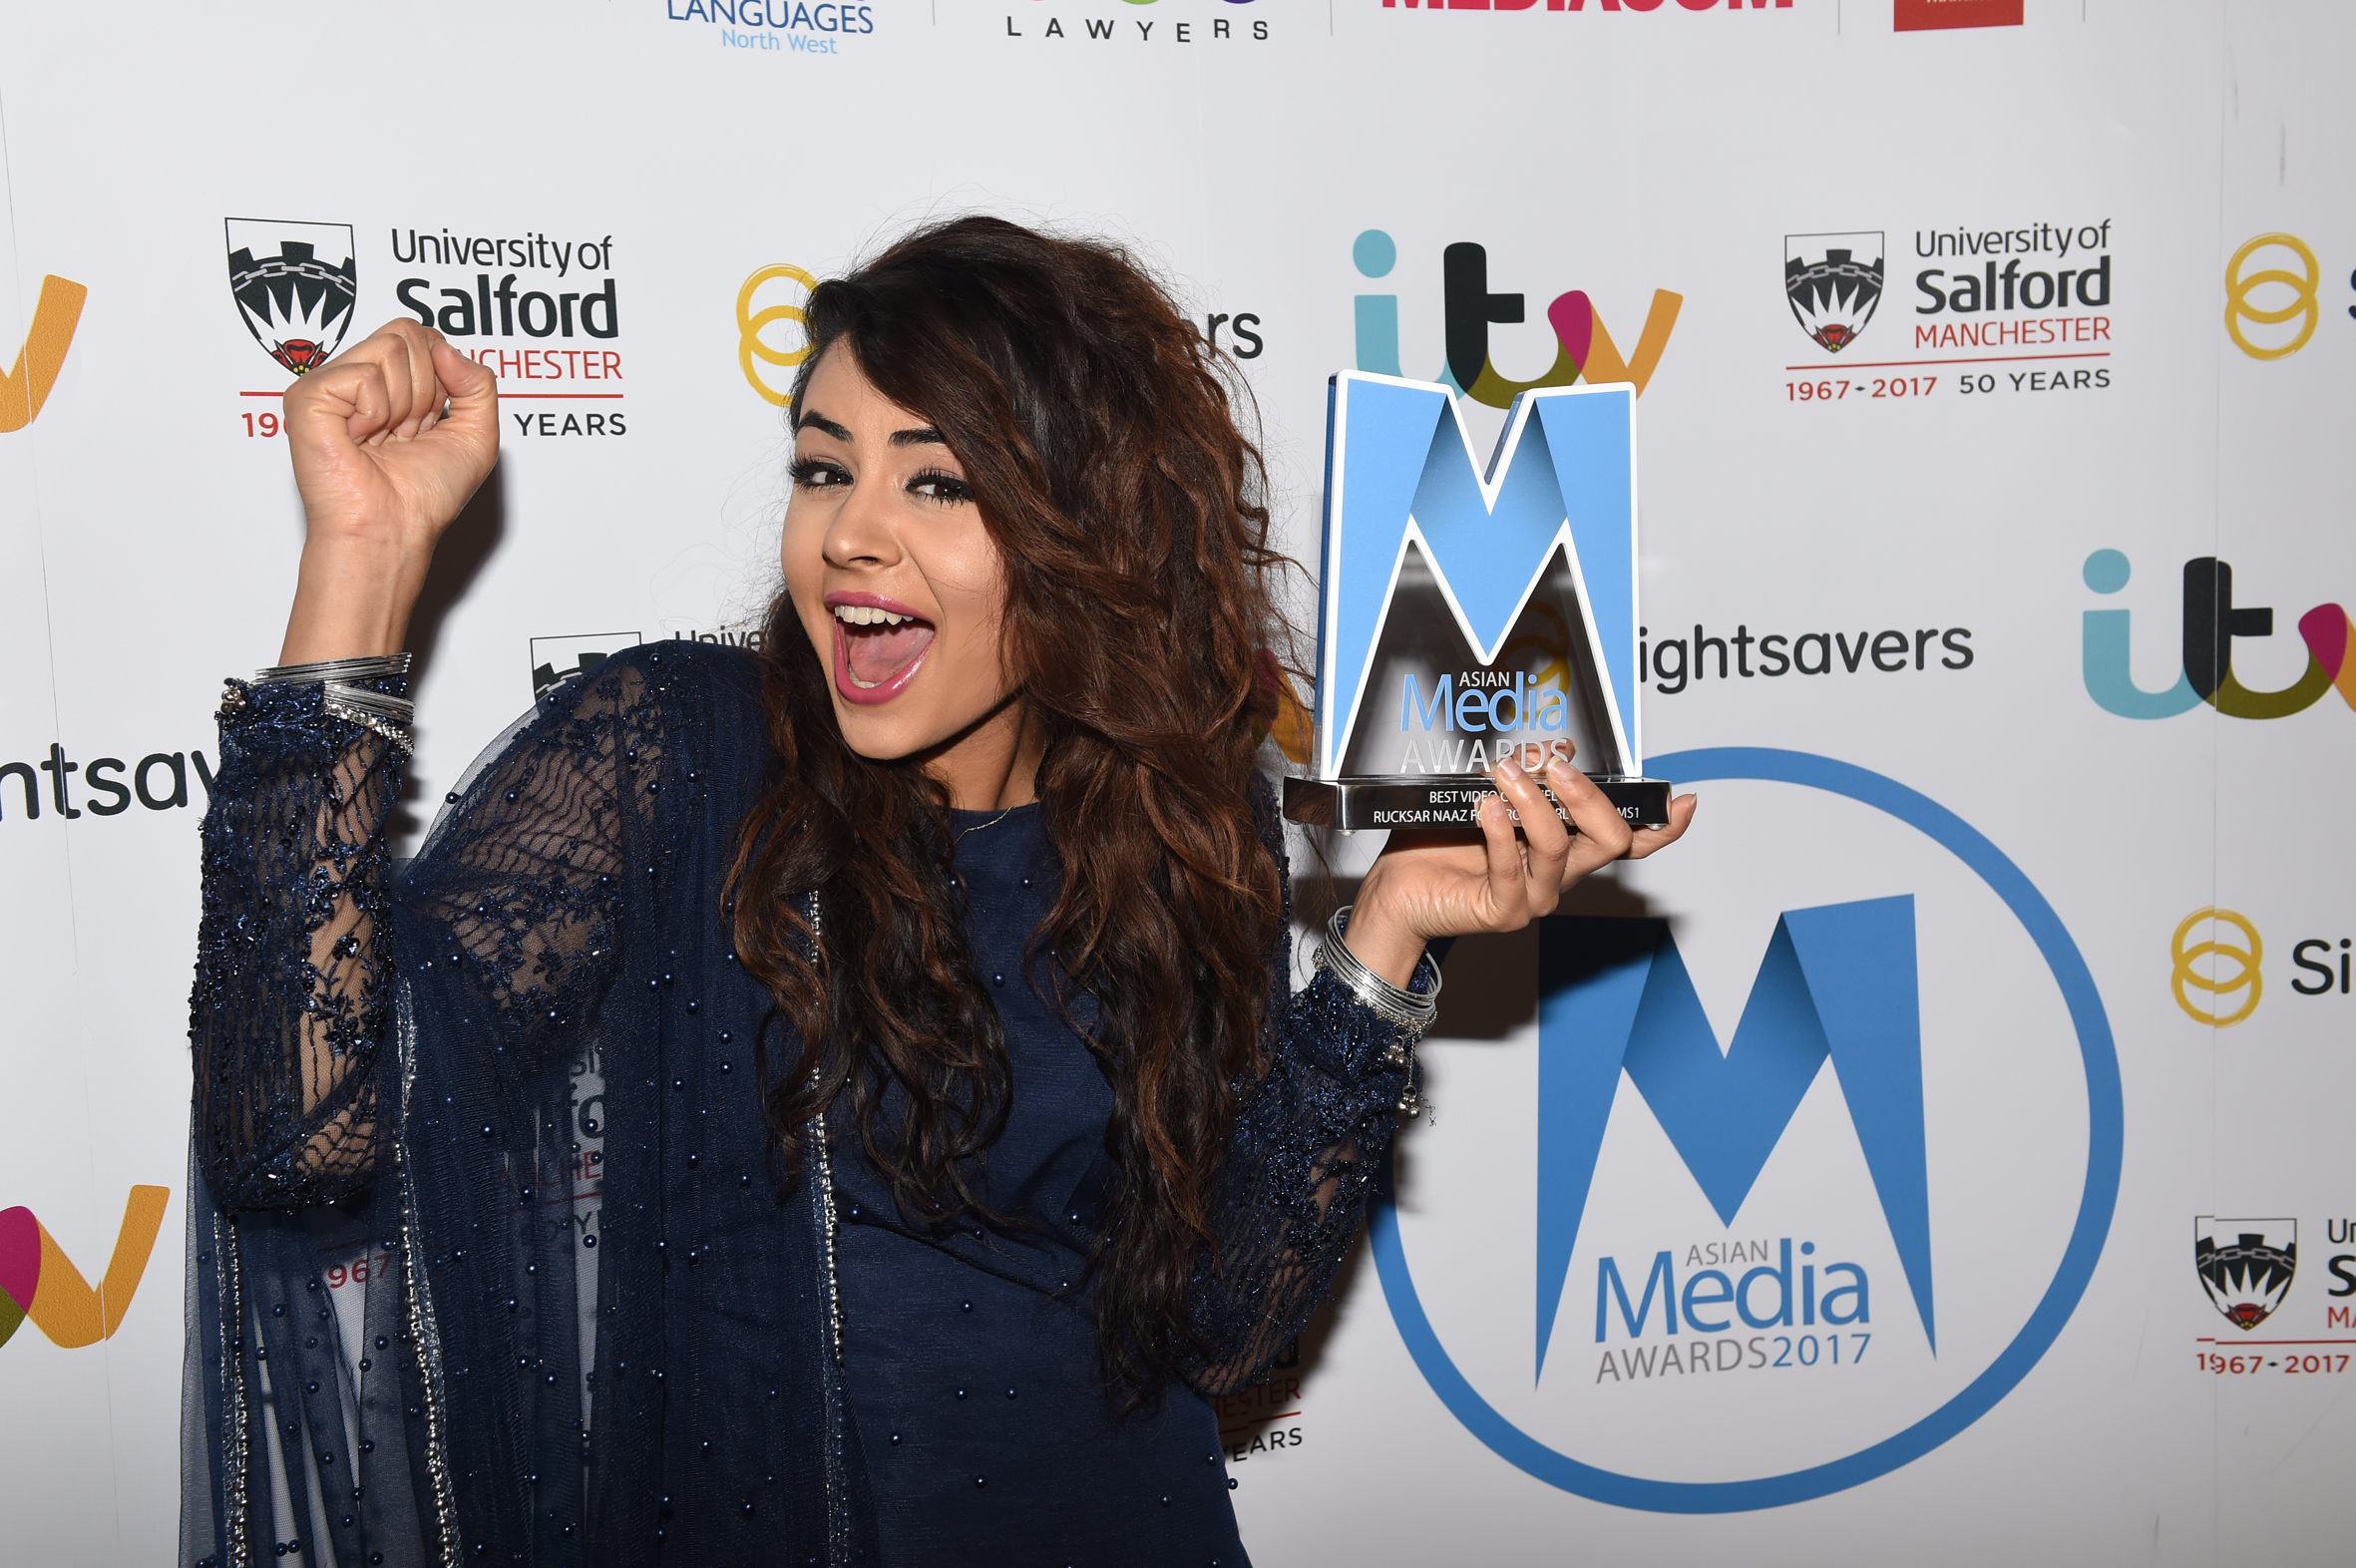 Rucksar Naaz wins Best Video Channel Award 2017 for Brown Girl Problems 1